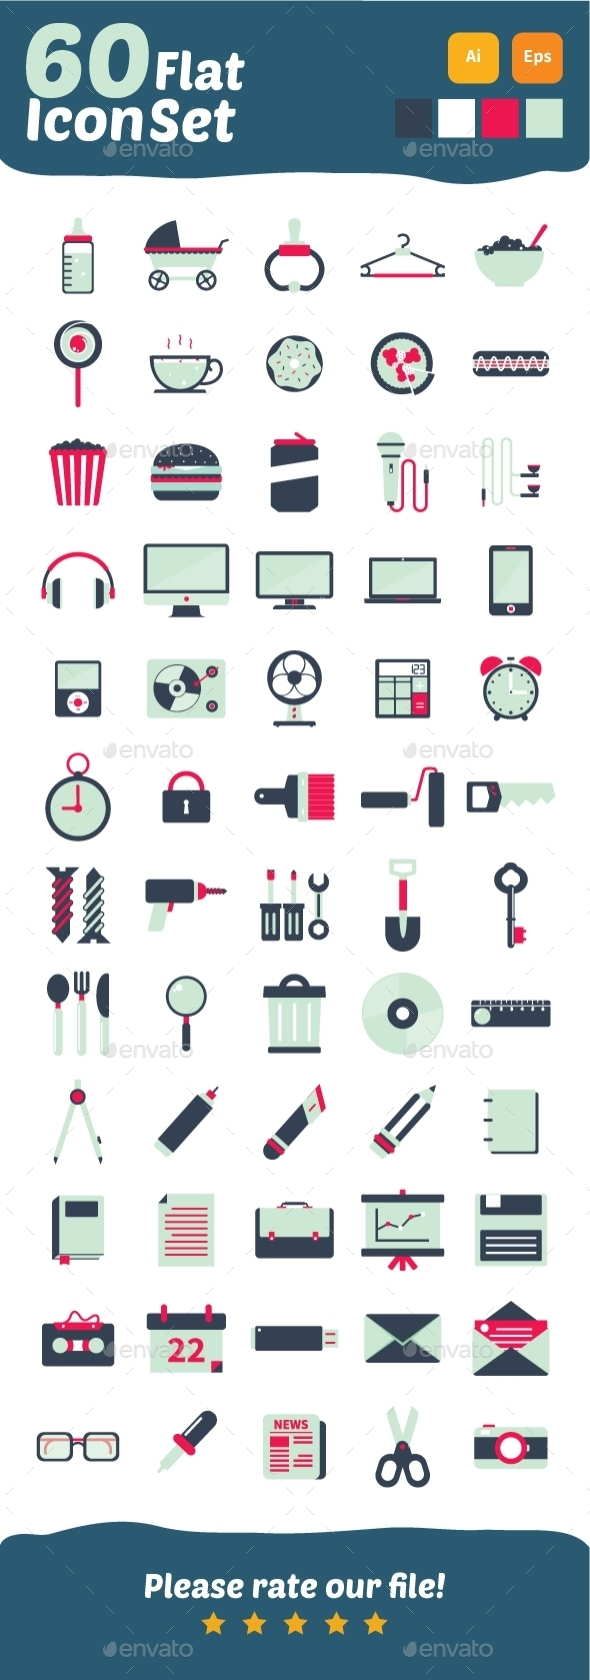 60 Flat Icons Design